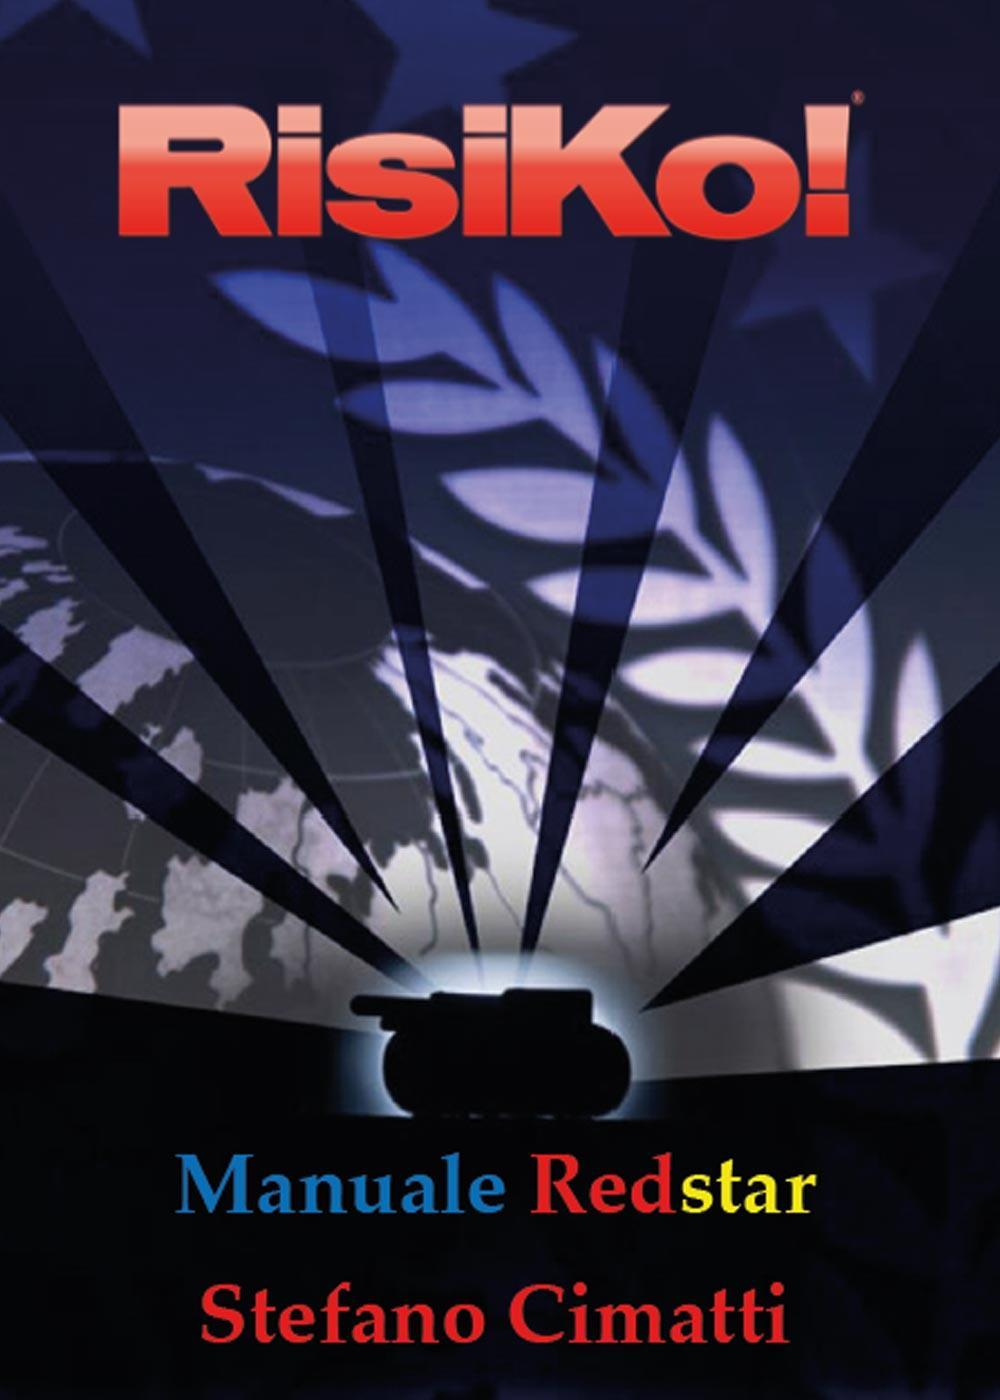 Manuale Redstar di Risiko